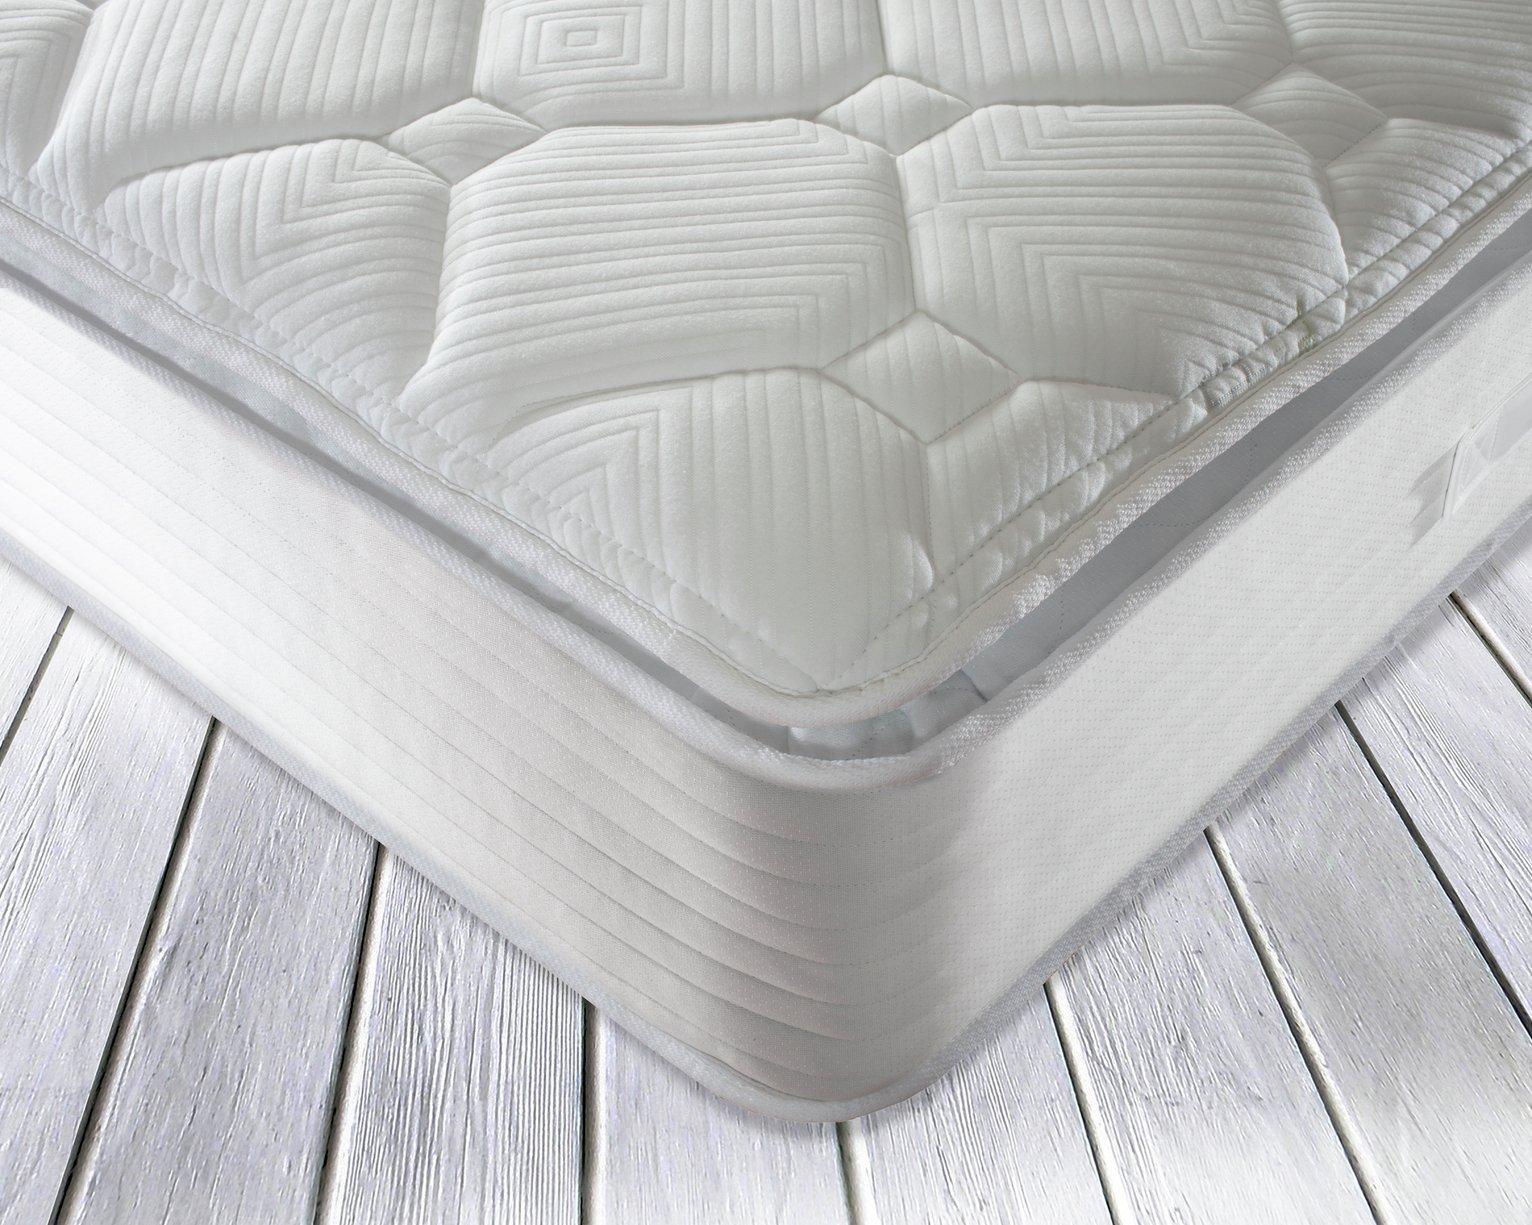 Sealy Activ 2200 Pocket Gel Pillowtop Double Mattress